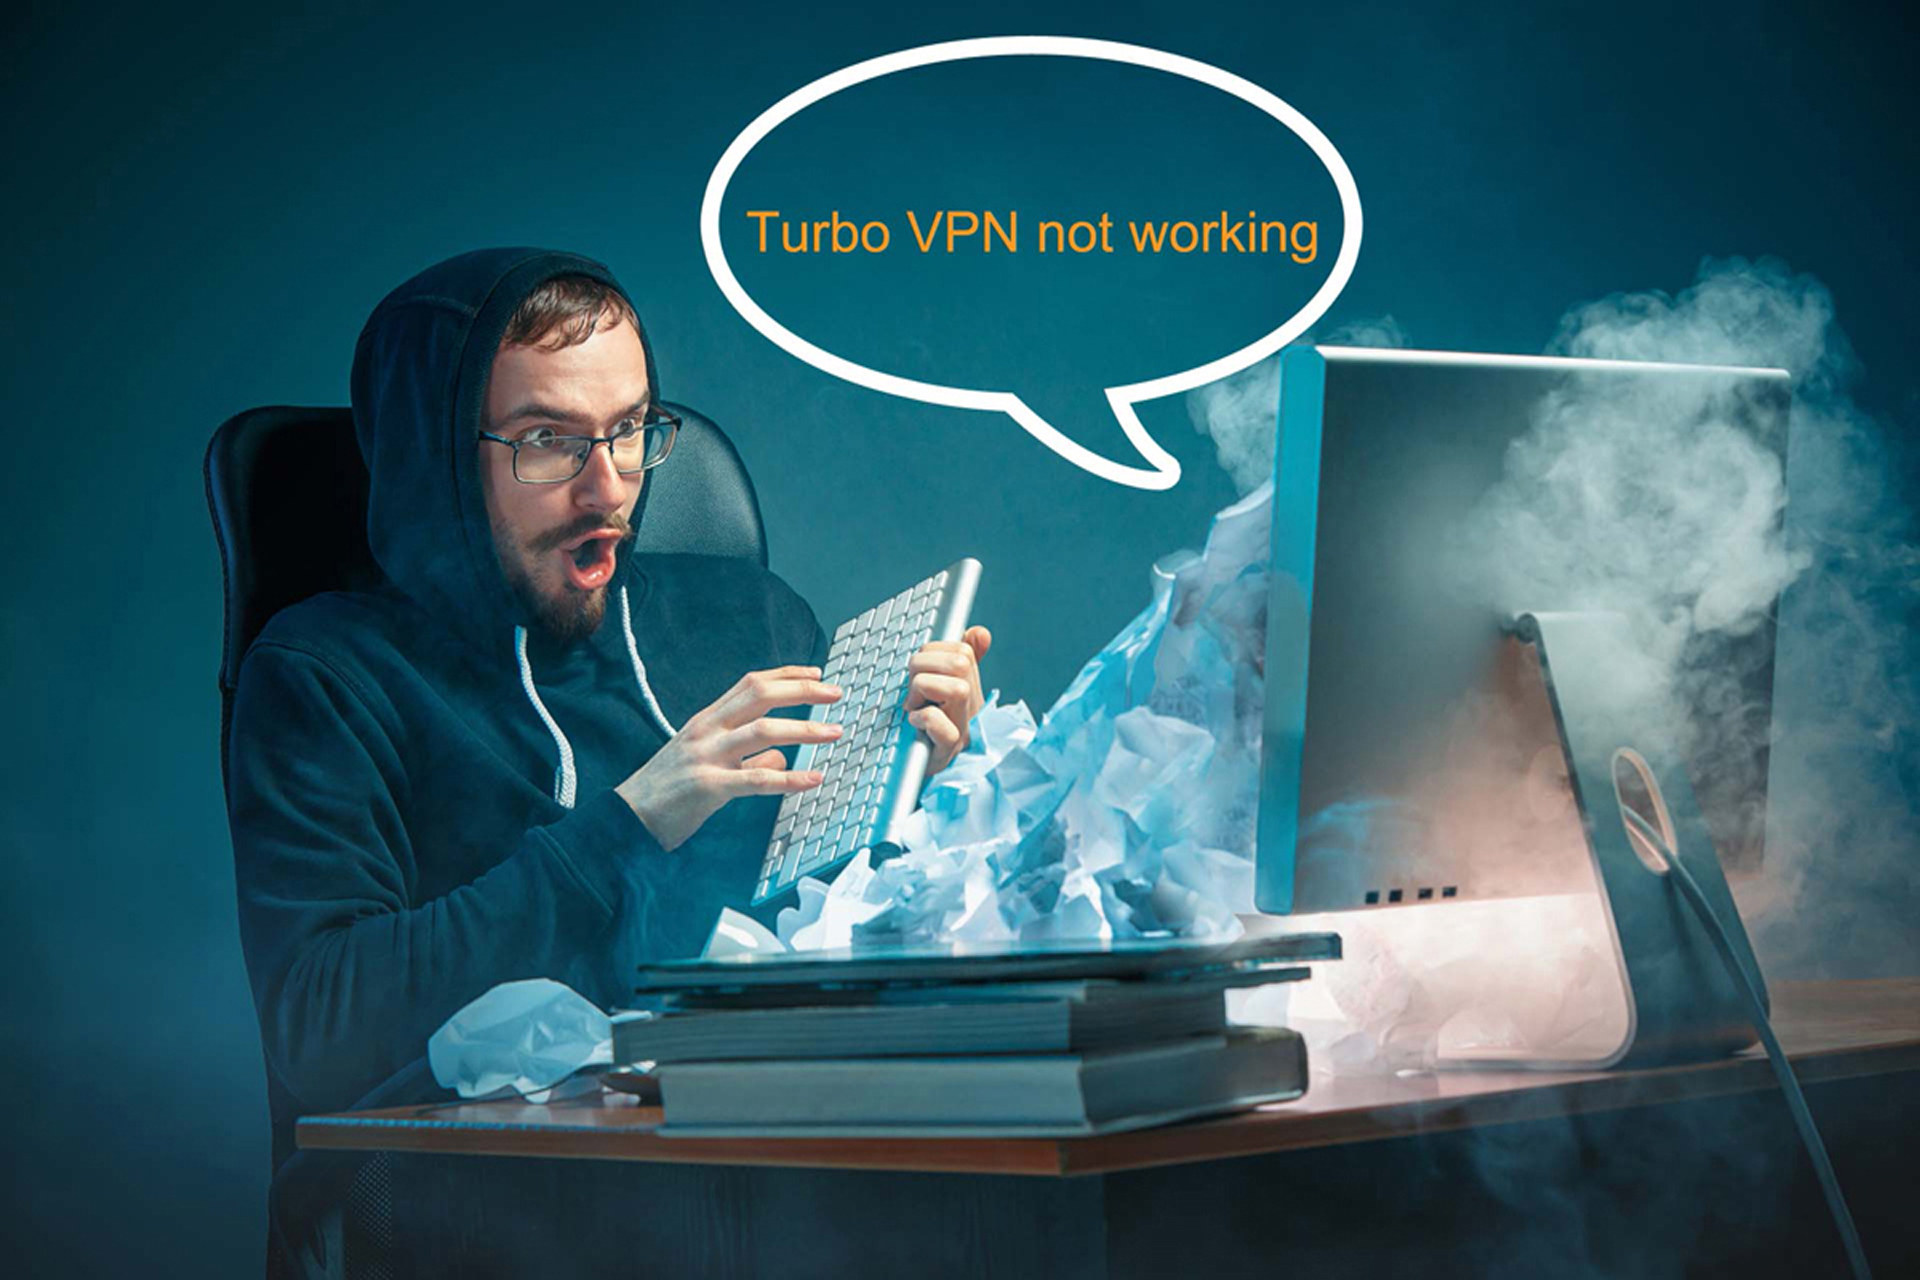 Turbo VPN not working